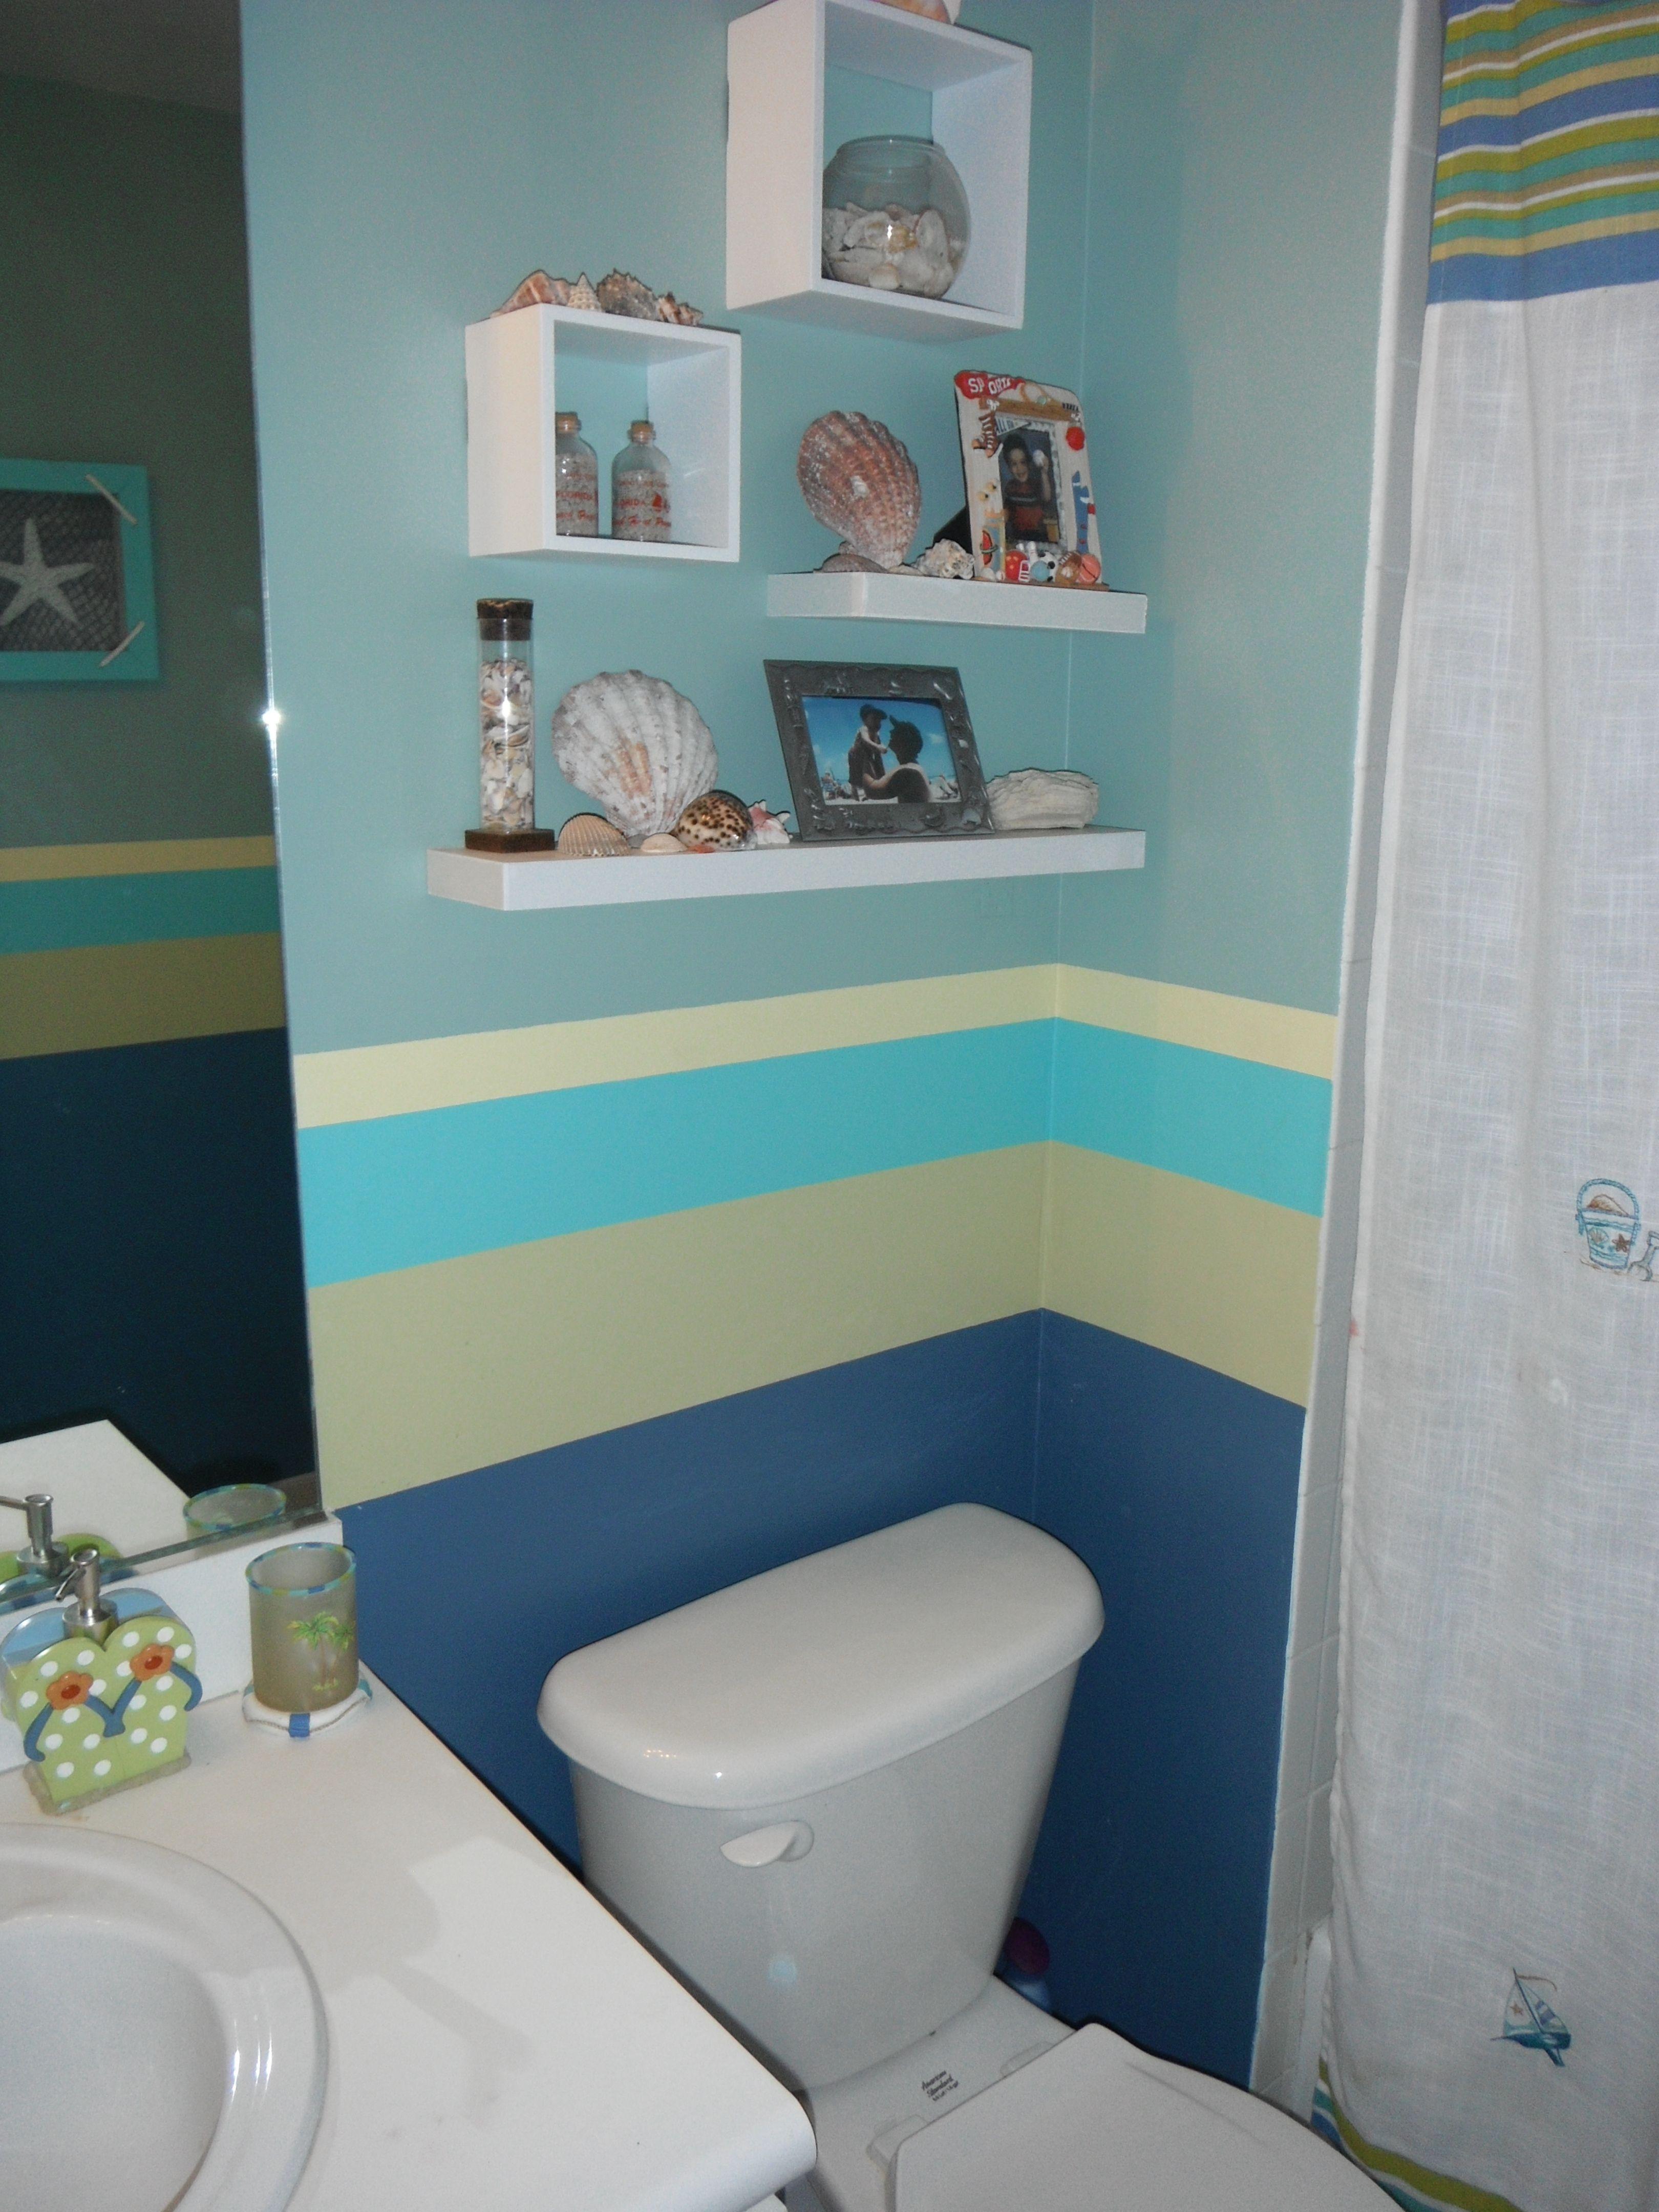 Superbe PRISM Painting U0026 Pressure Wash: Boy/Girl Shared Bathroom. 5 Custom Colors,